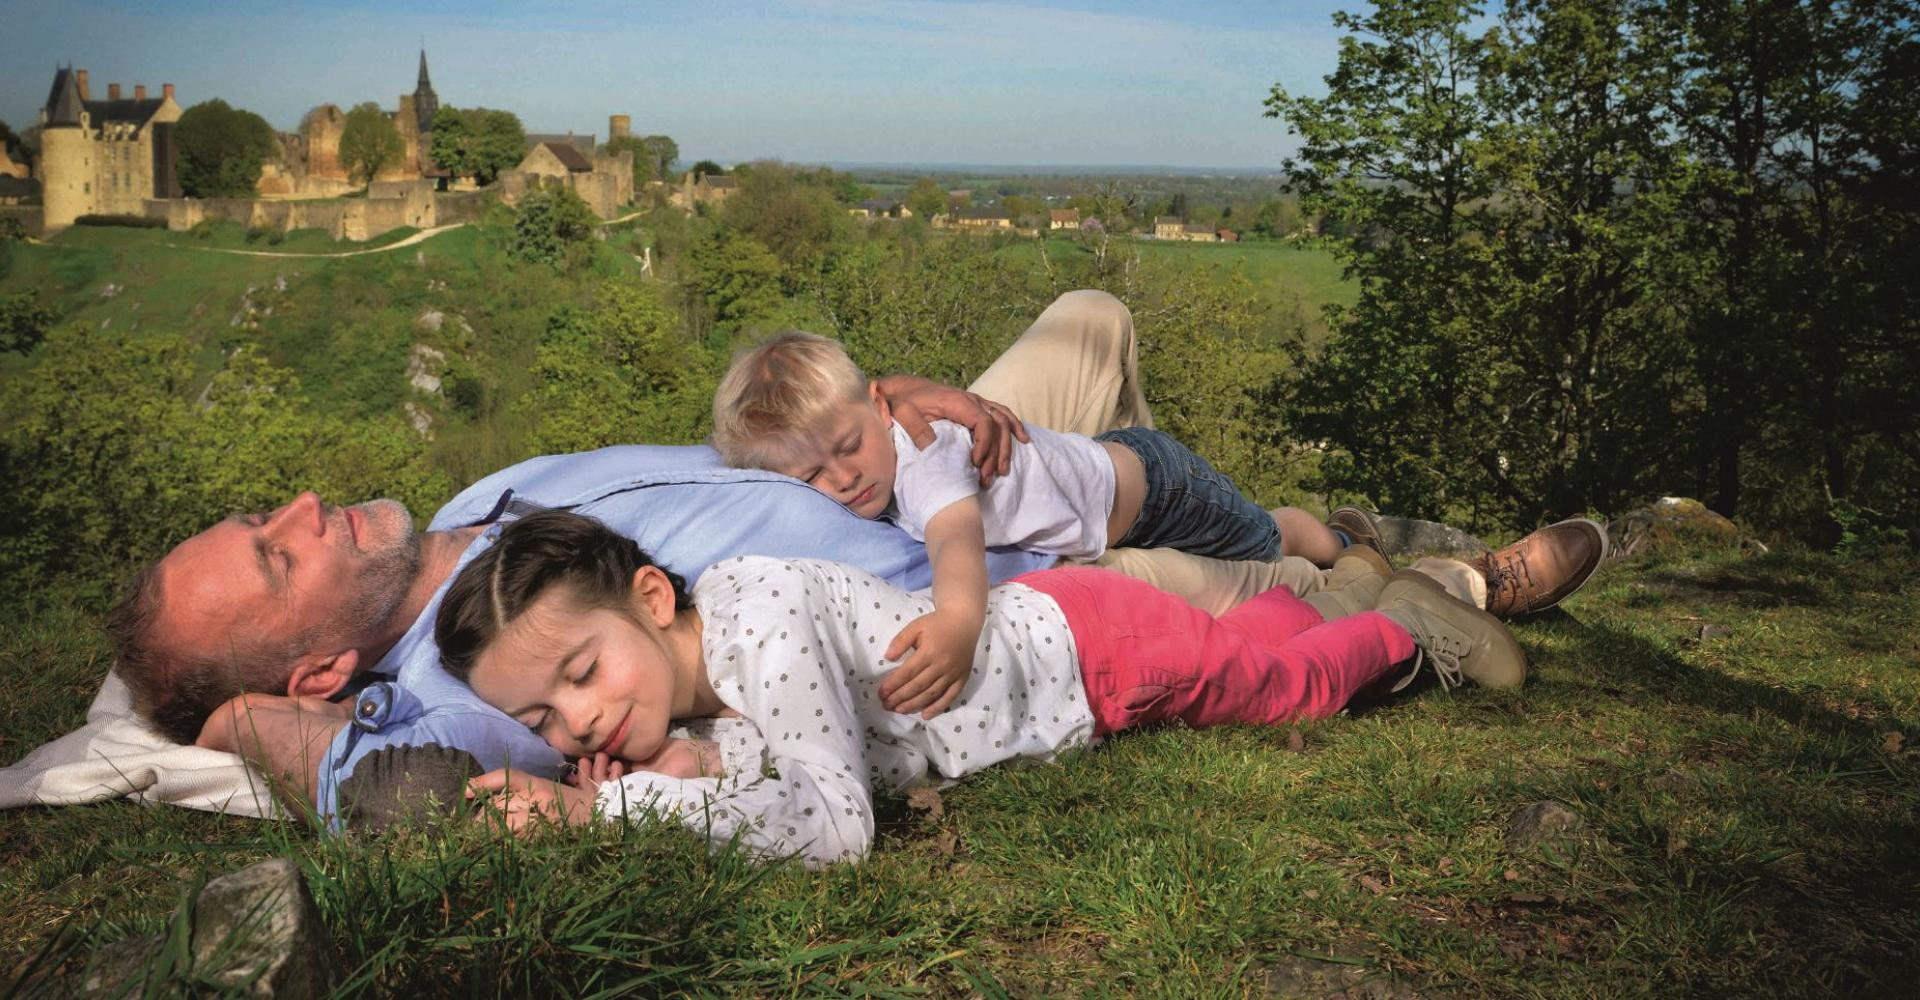 Sieste en famille avec vue sur Sainte-Suzanne en Mayenne